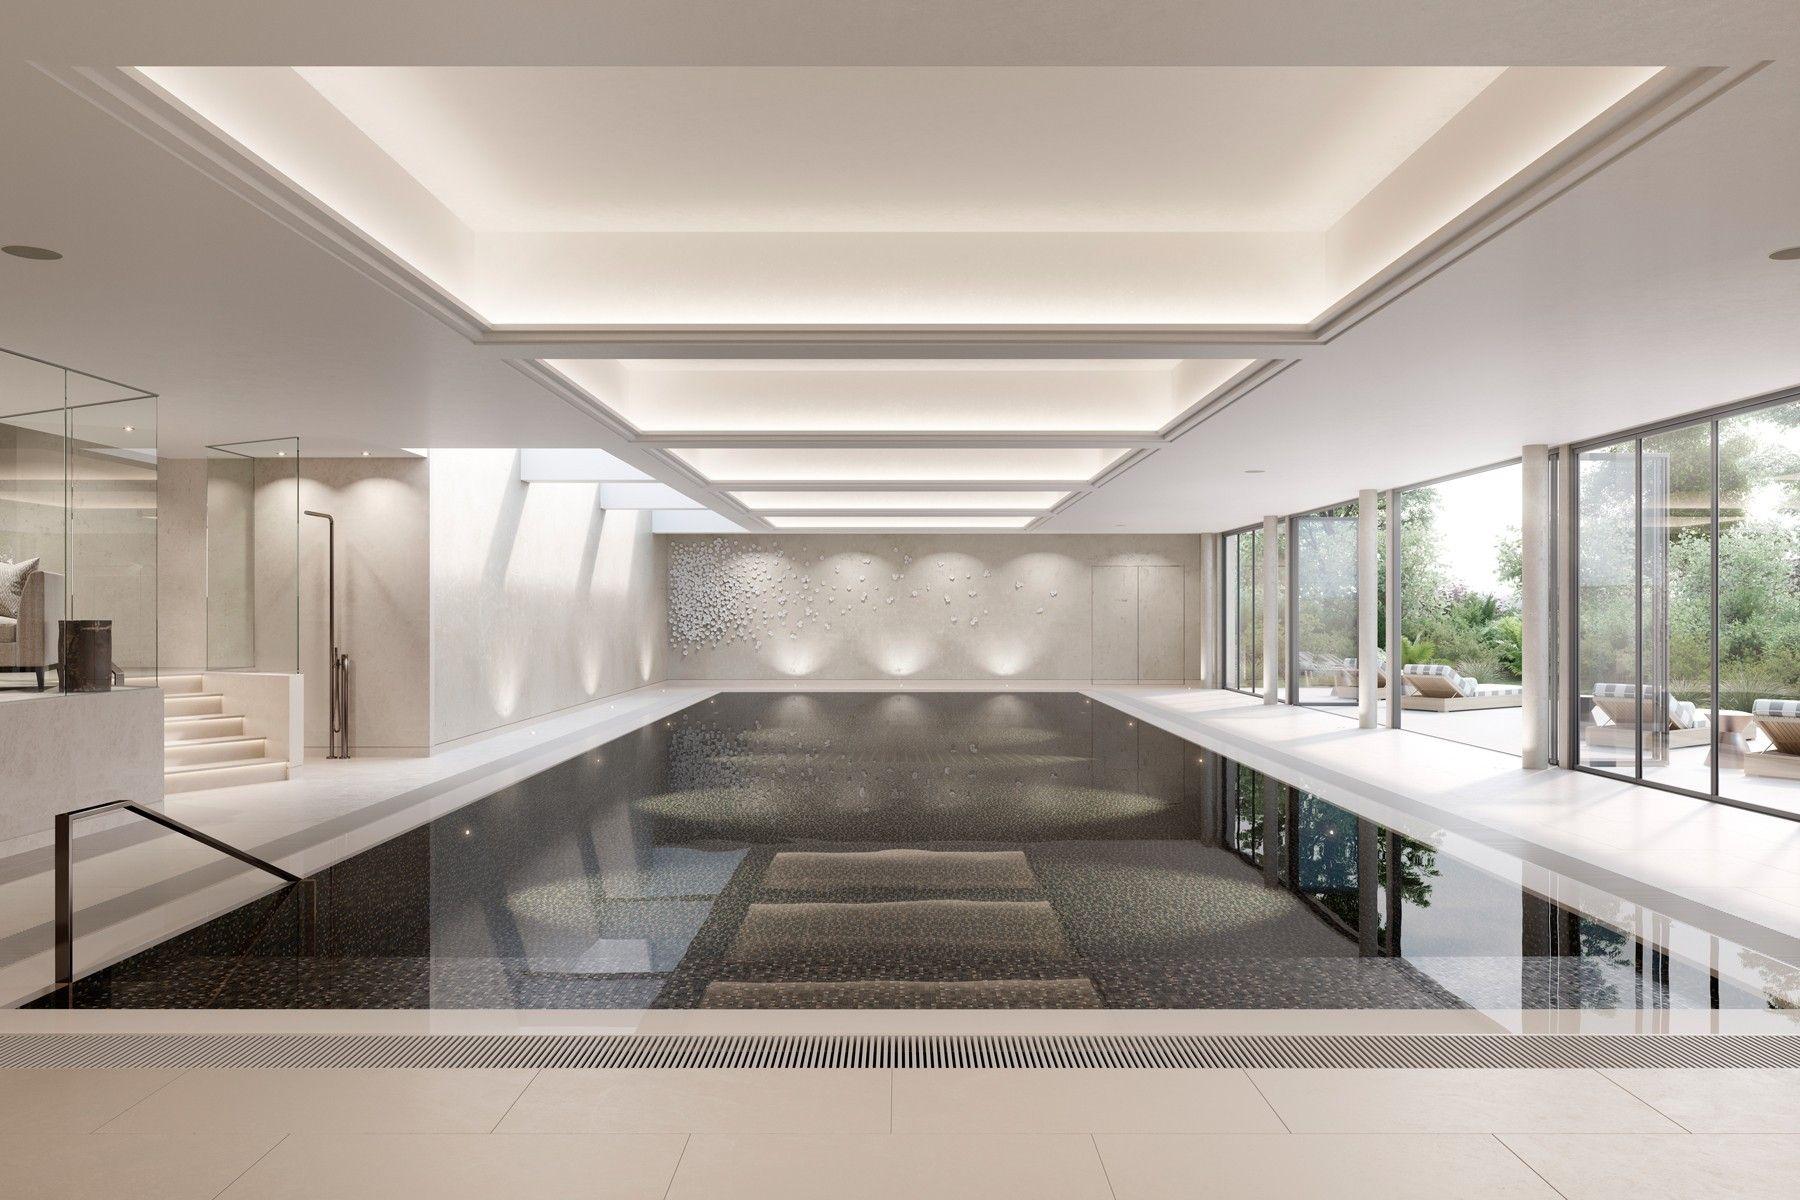 Surrey family home luxury interior design laura hammett for Interior design surrey